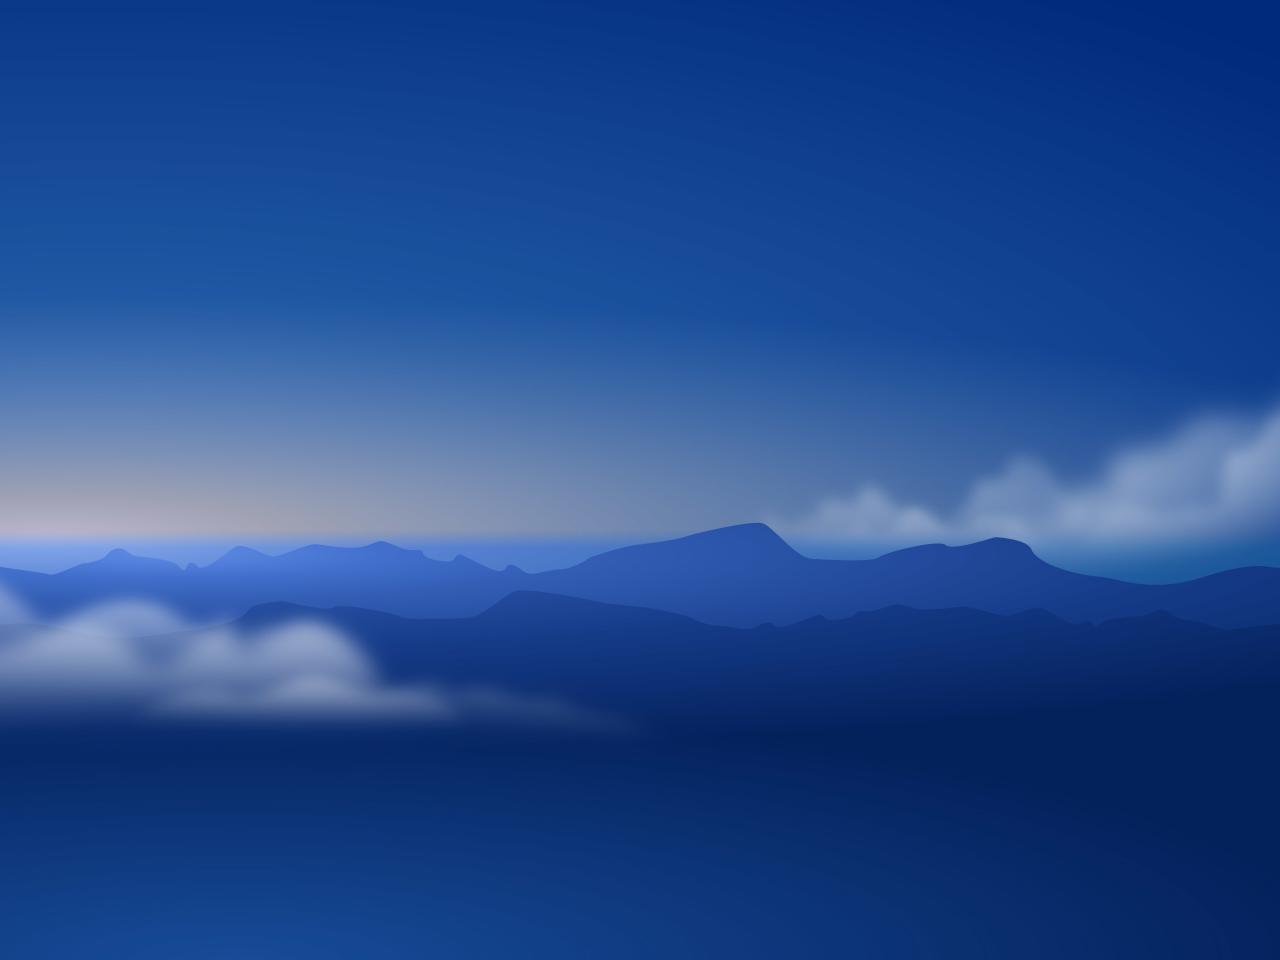 Minimalism Mountain Peak Full Hd Wallpaper: Mountains Minimalism, HD 4K Wallpaper